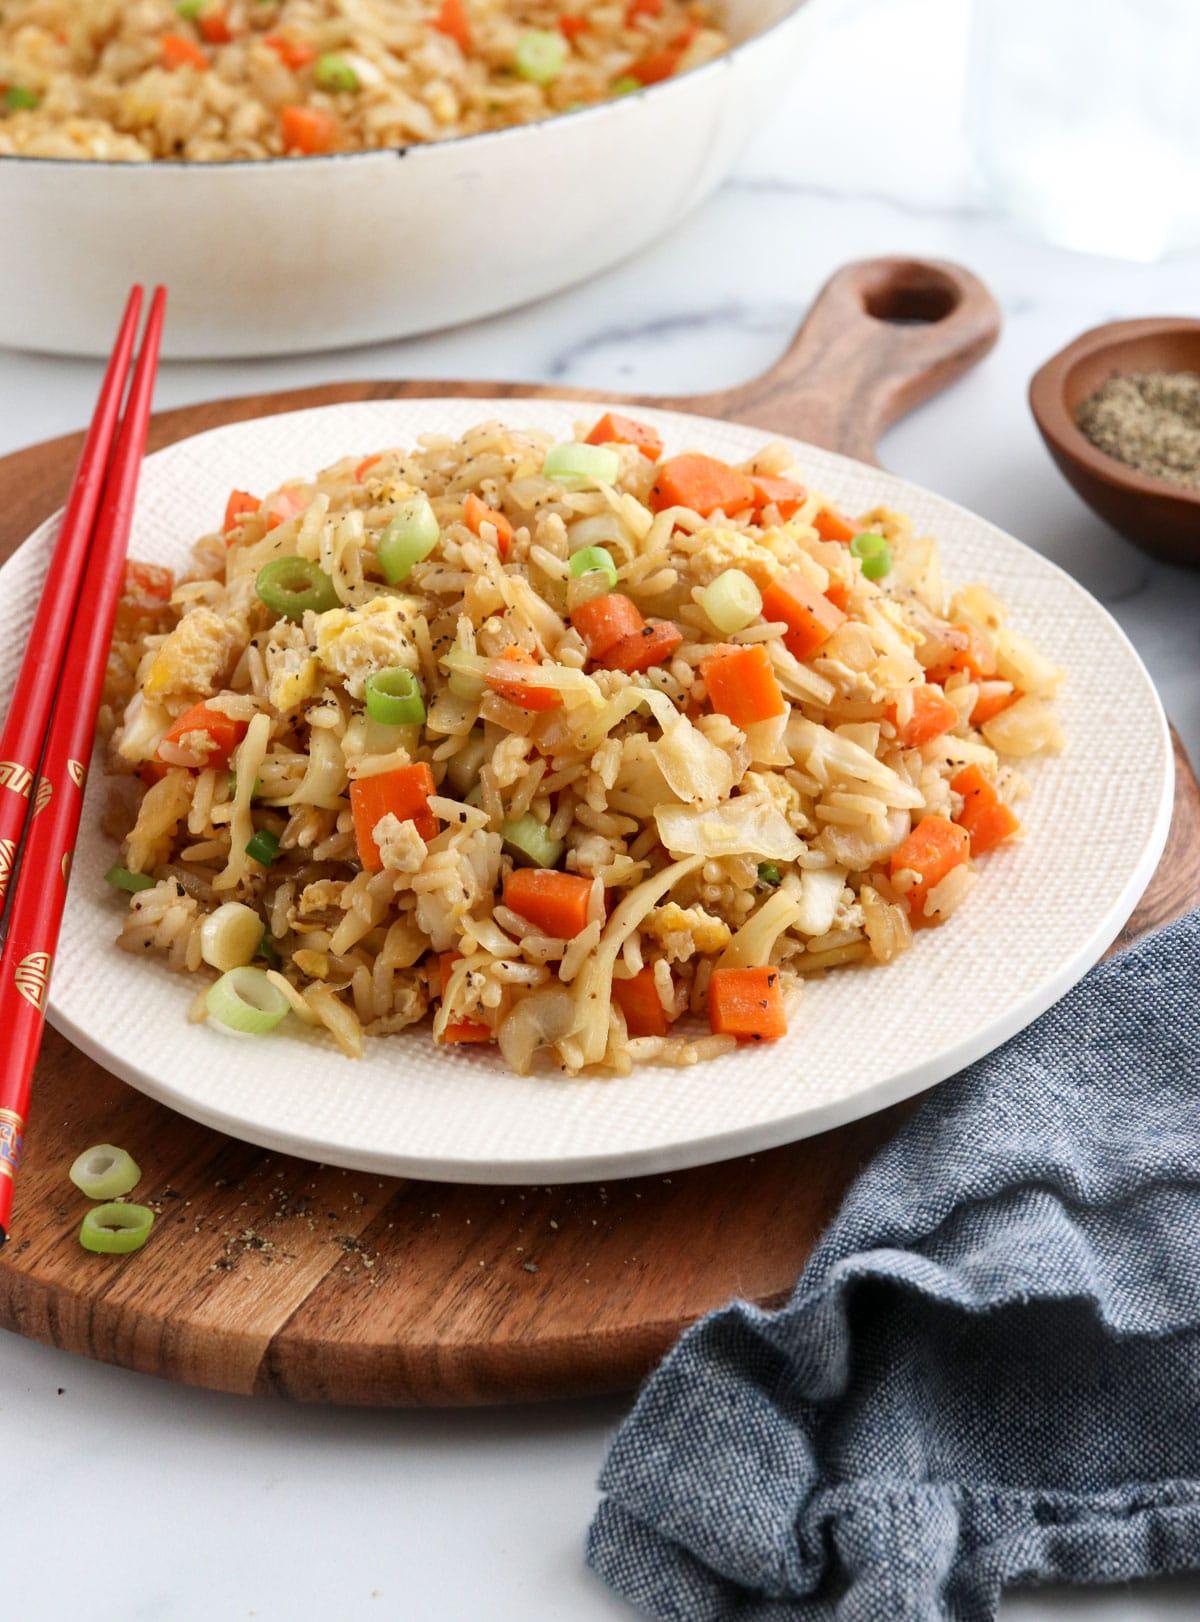 veggie fried rice served with chopsticks